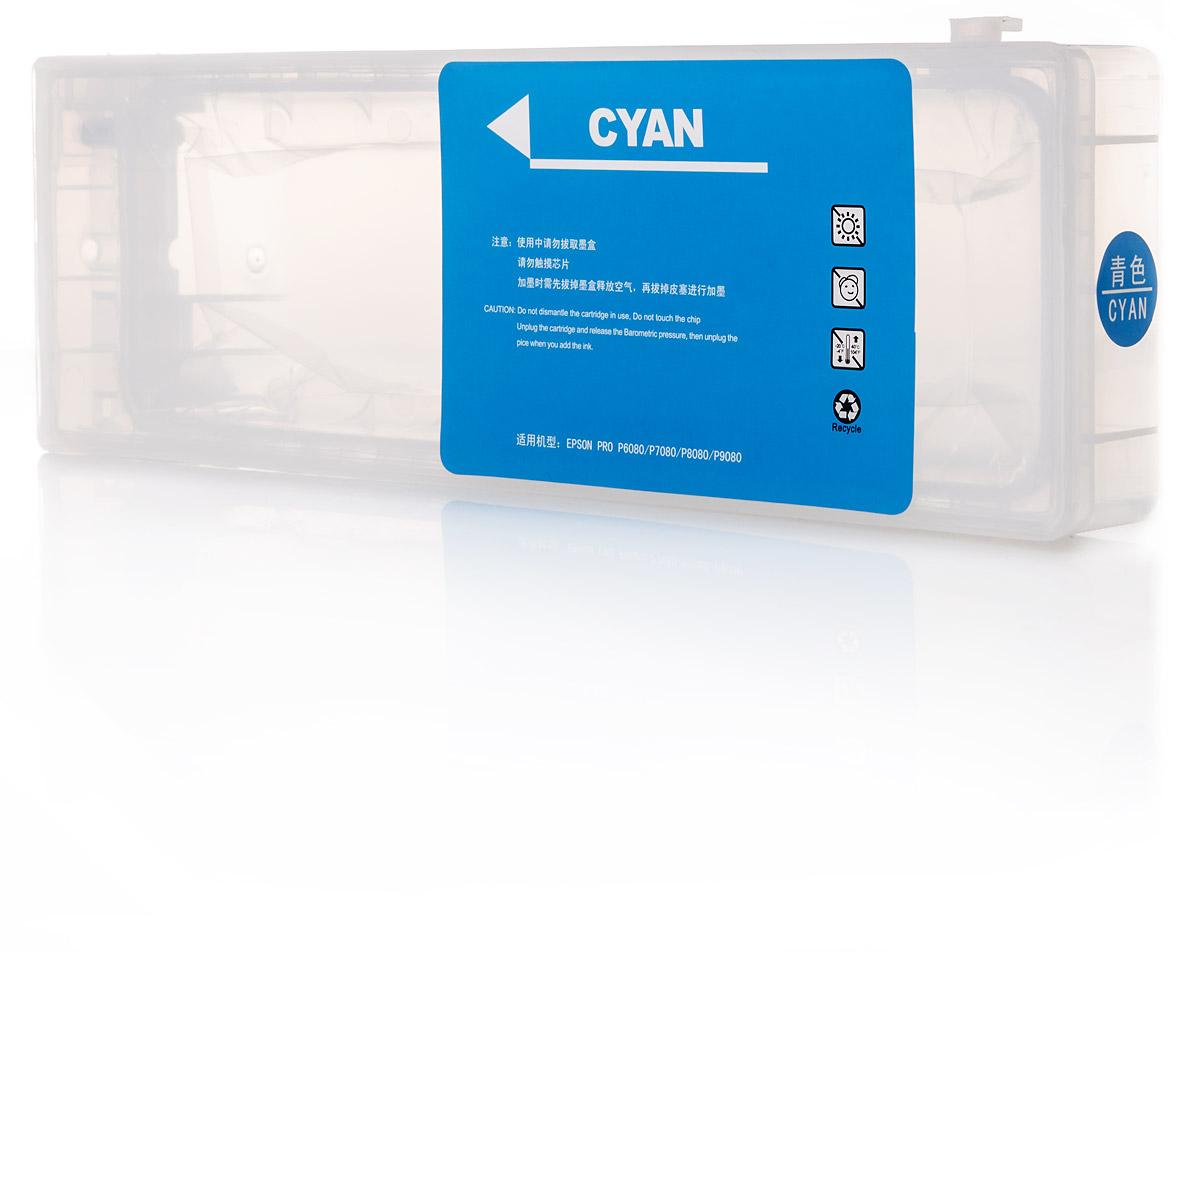 Leere Tintenpatrone | 700ml kompatibel für Epson Stylus Pro 7700|7900|9700/|9900